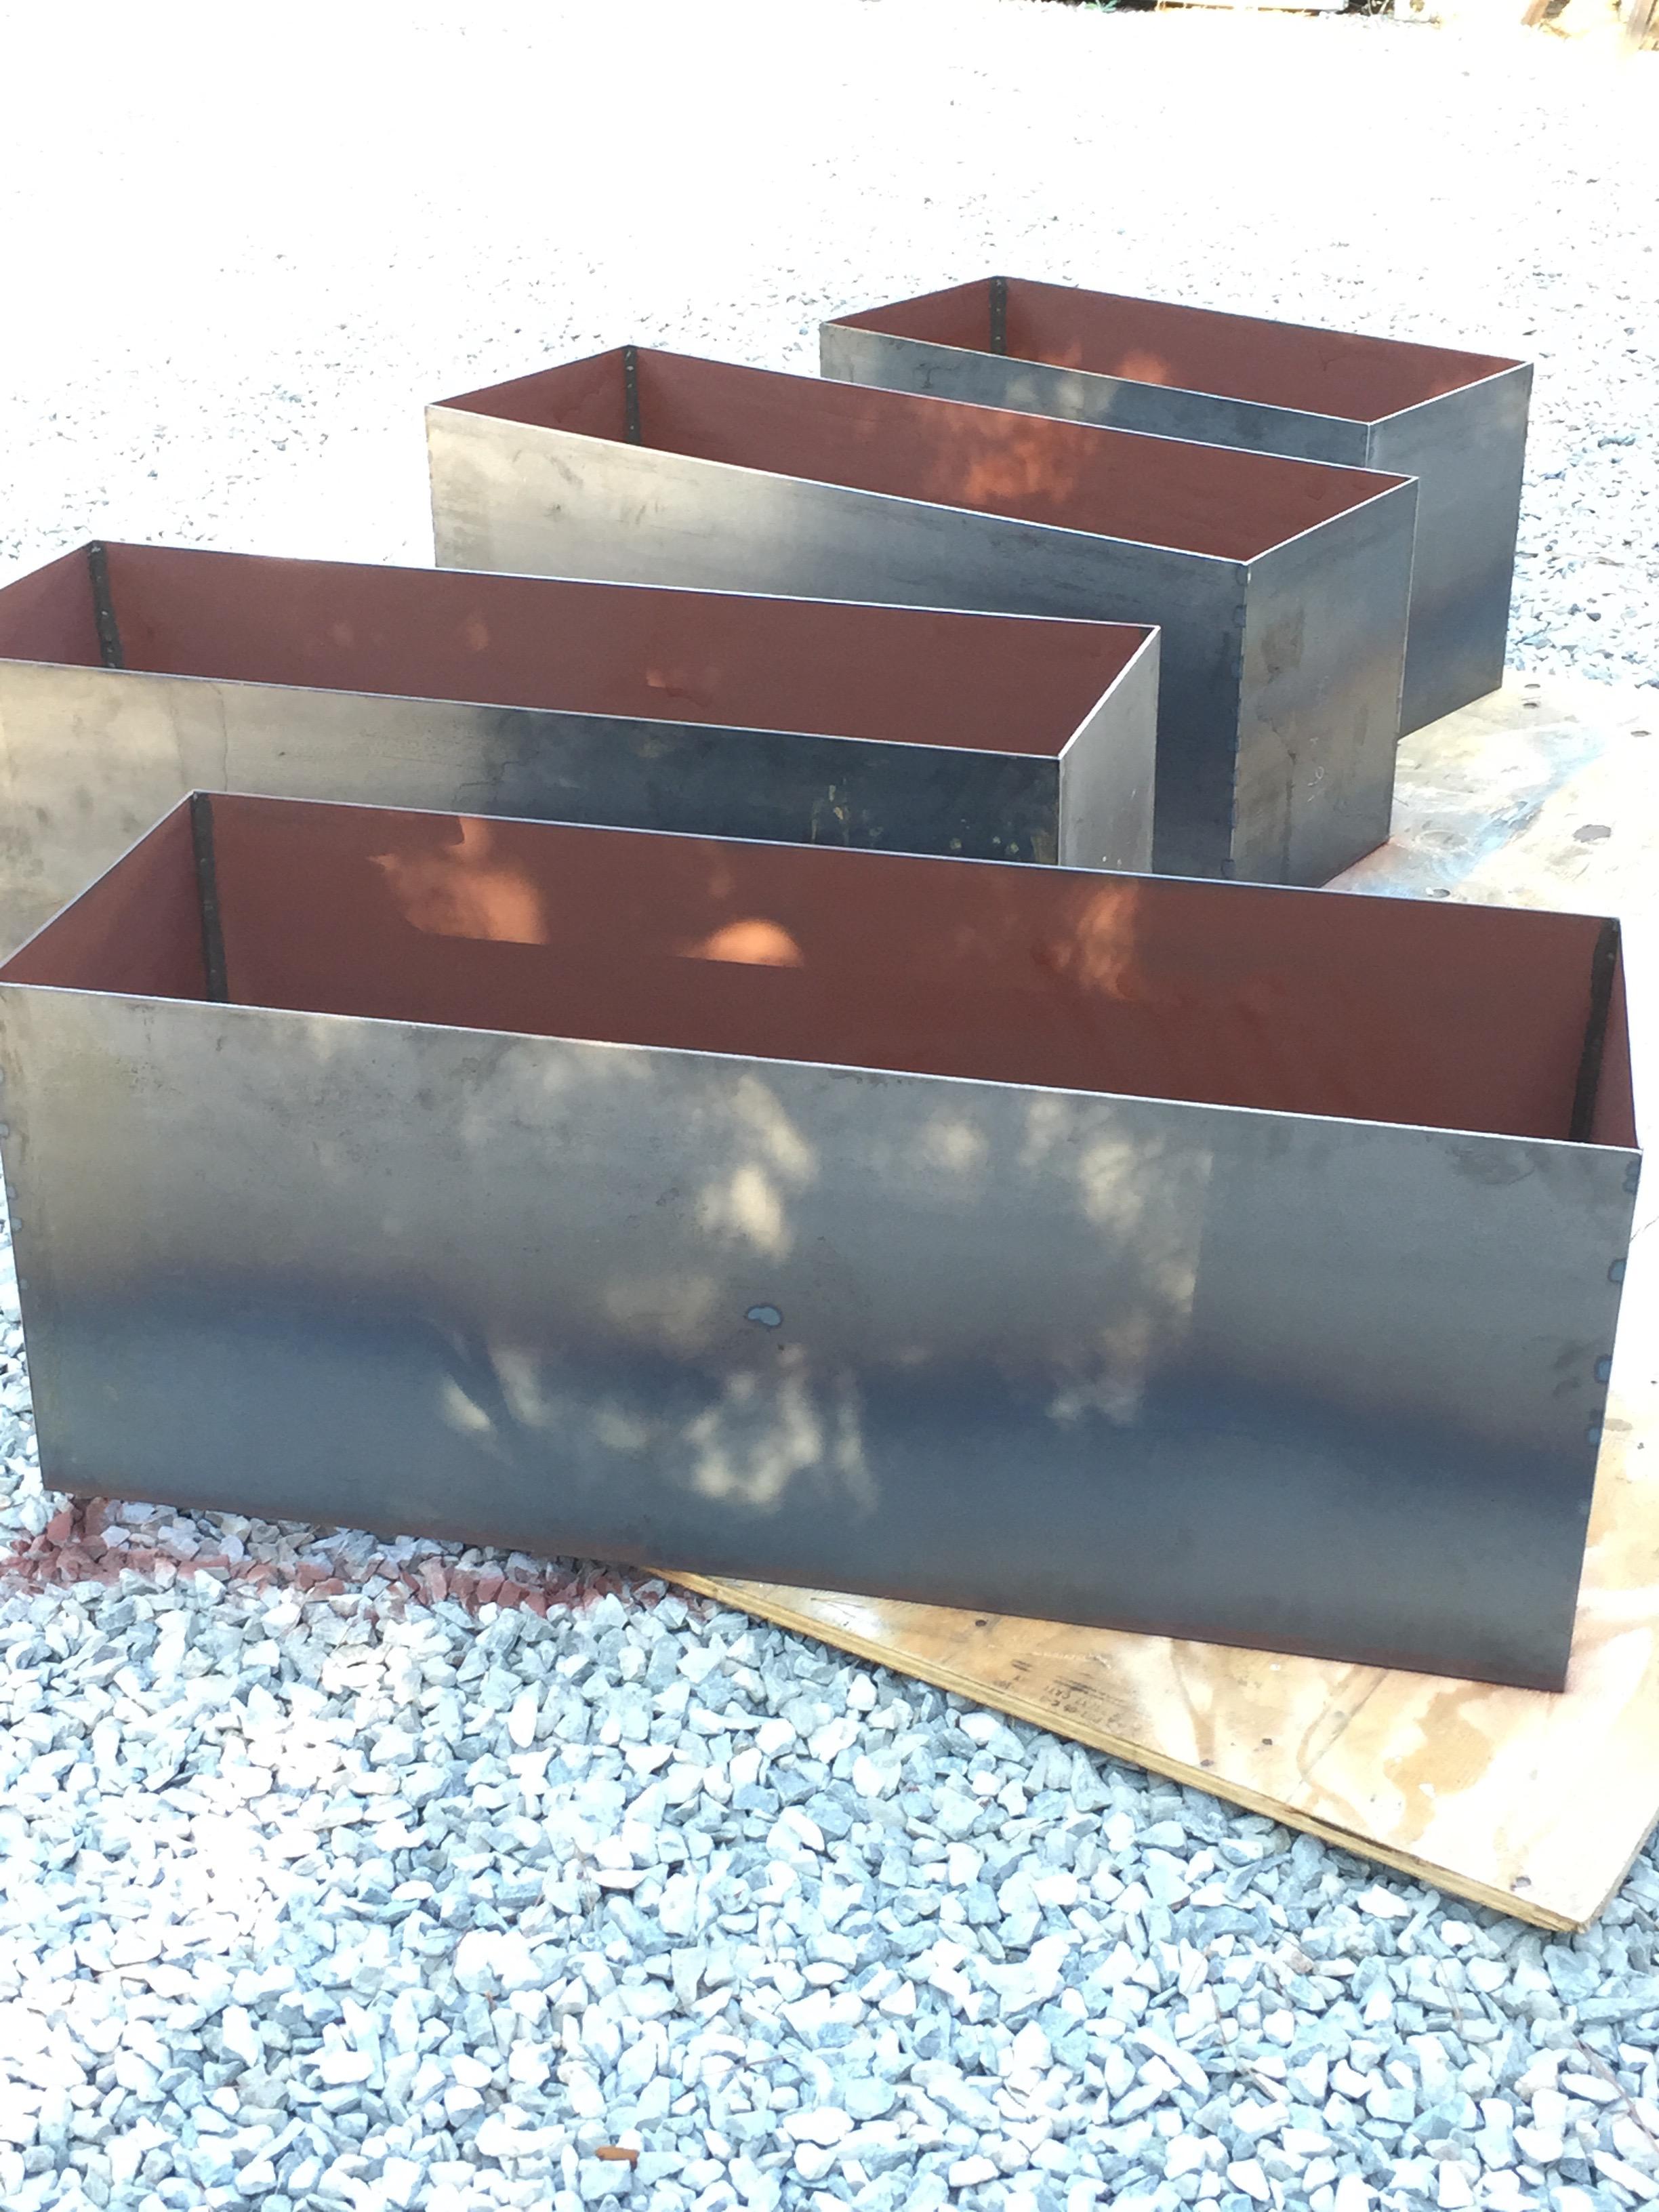 STEEL PLANTER BOXES.jpg